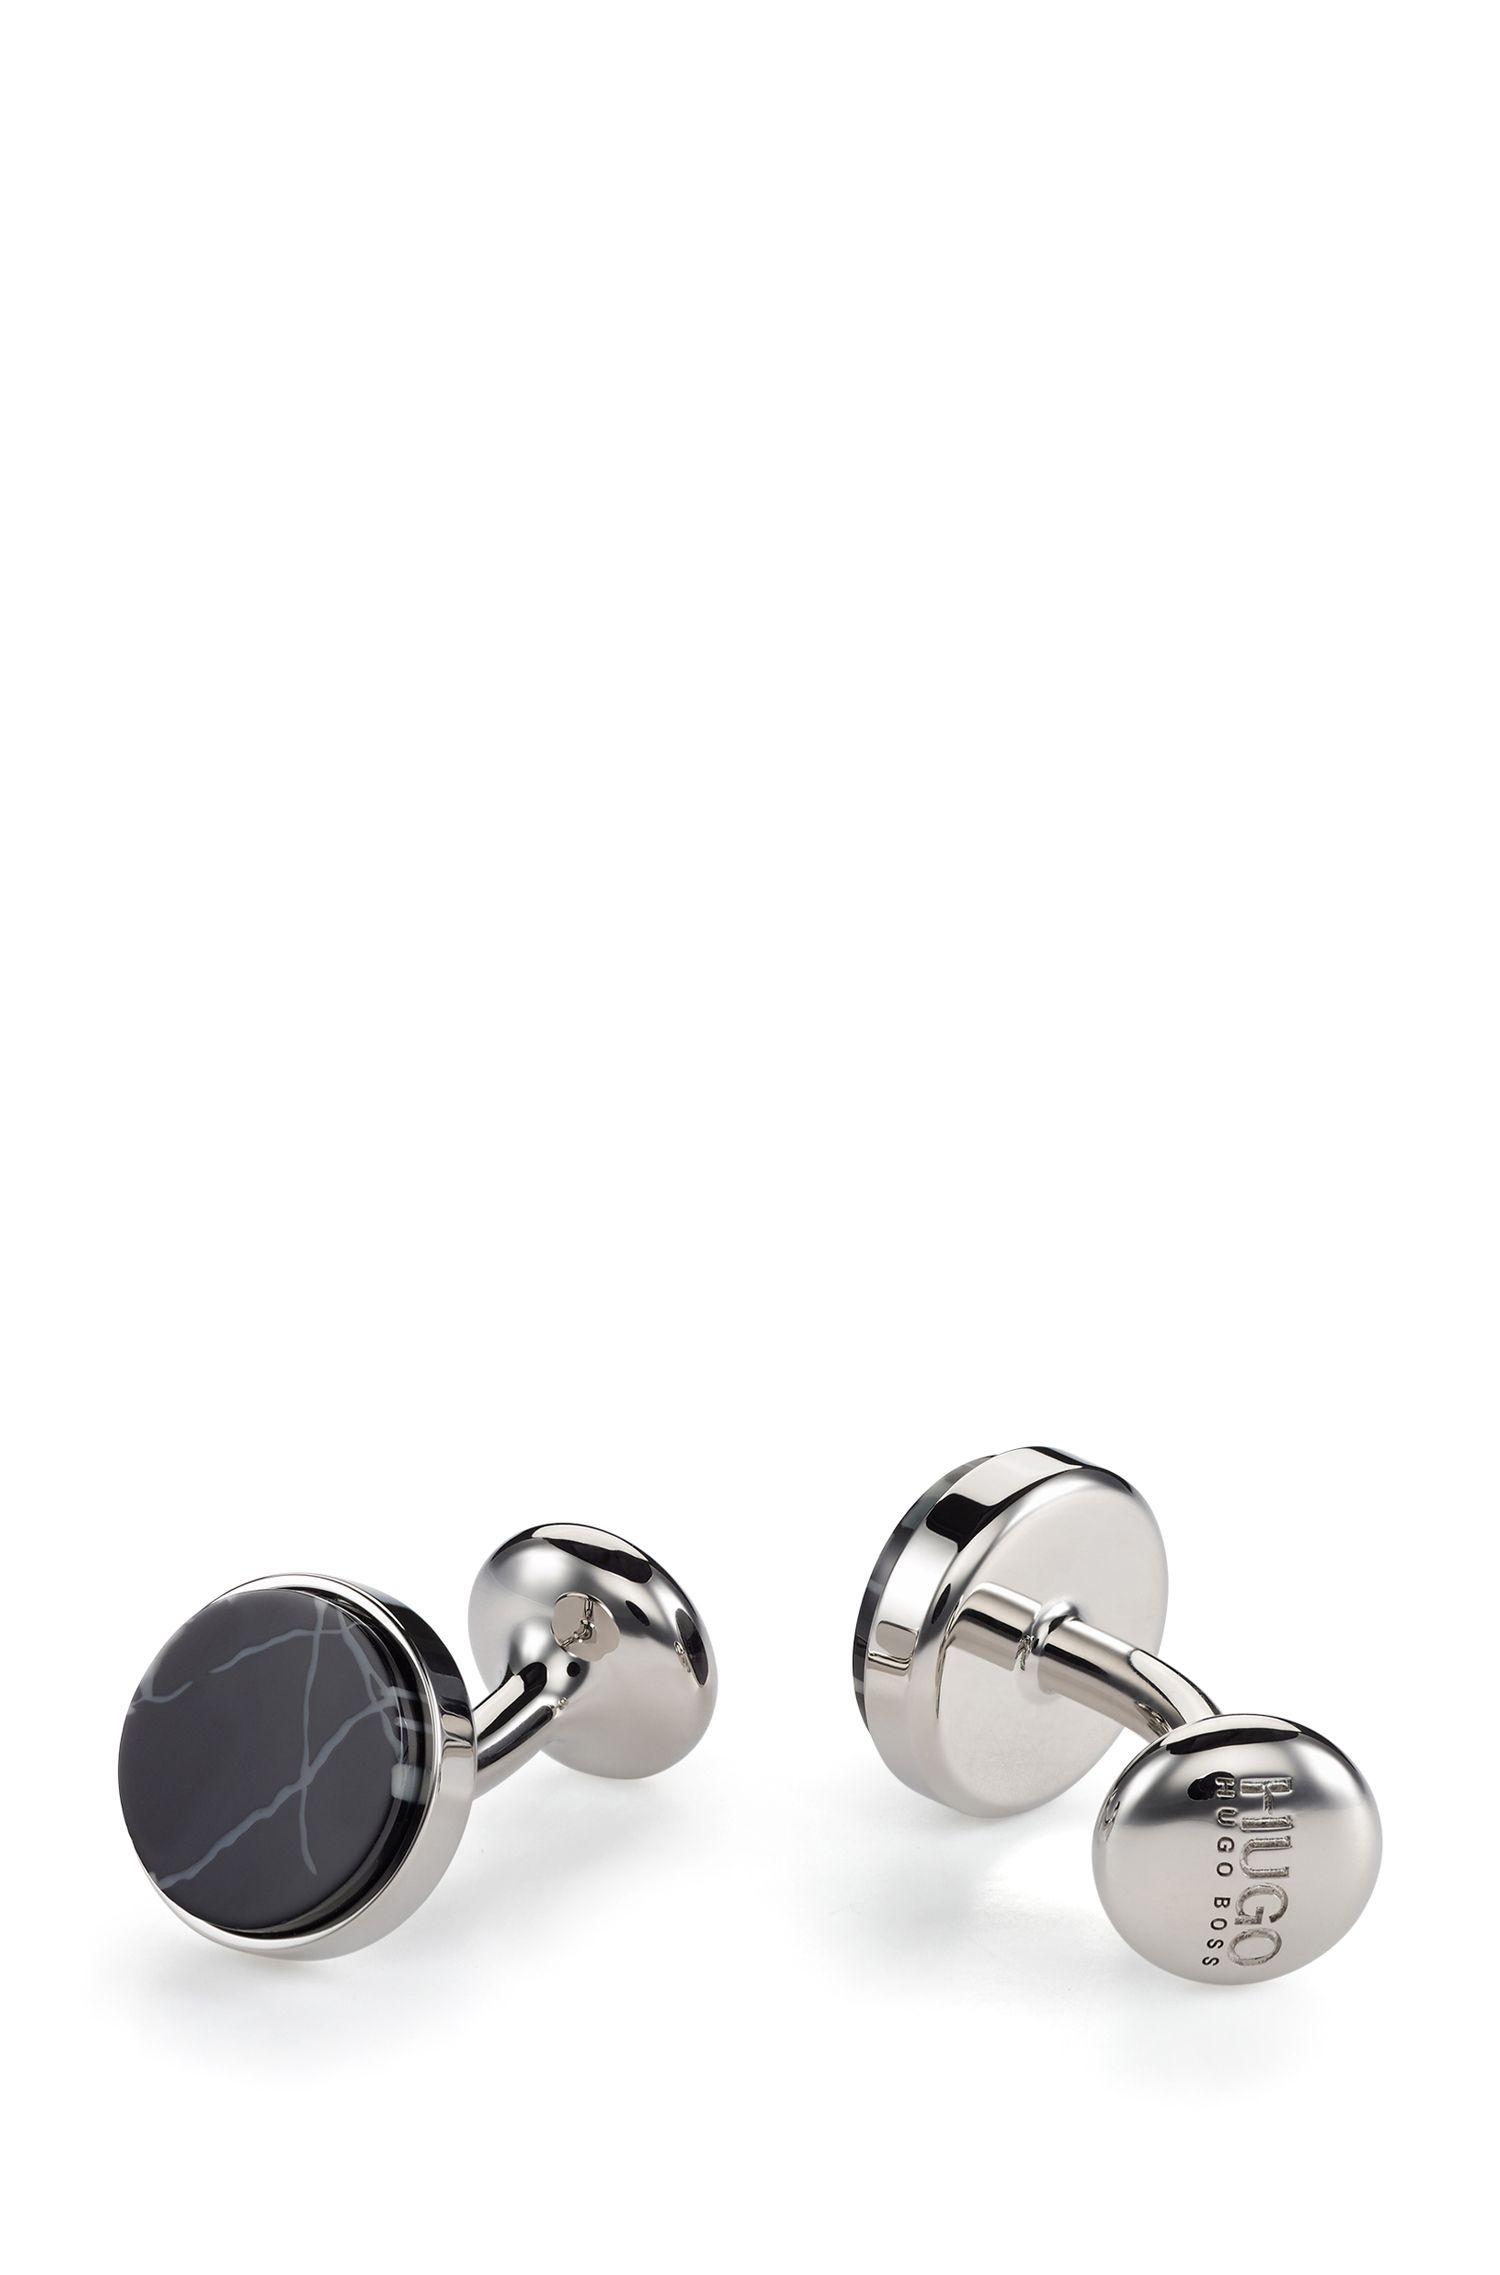 Marble & Brass Cufflinks | E-Marble